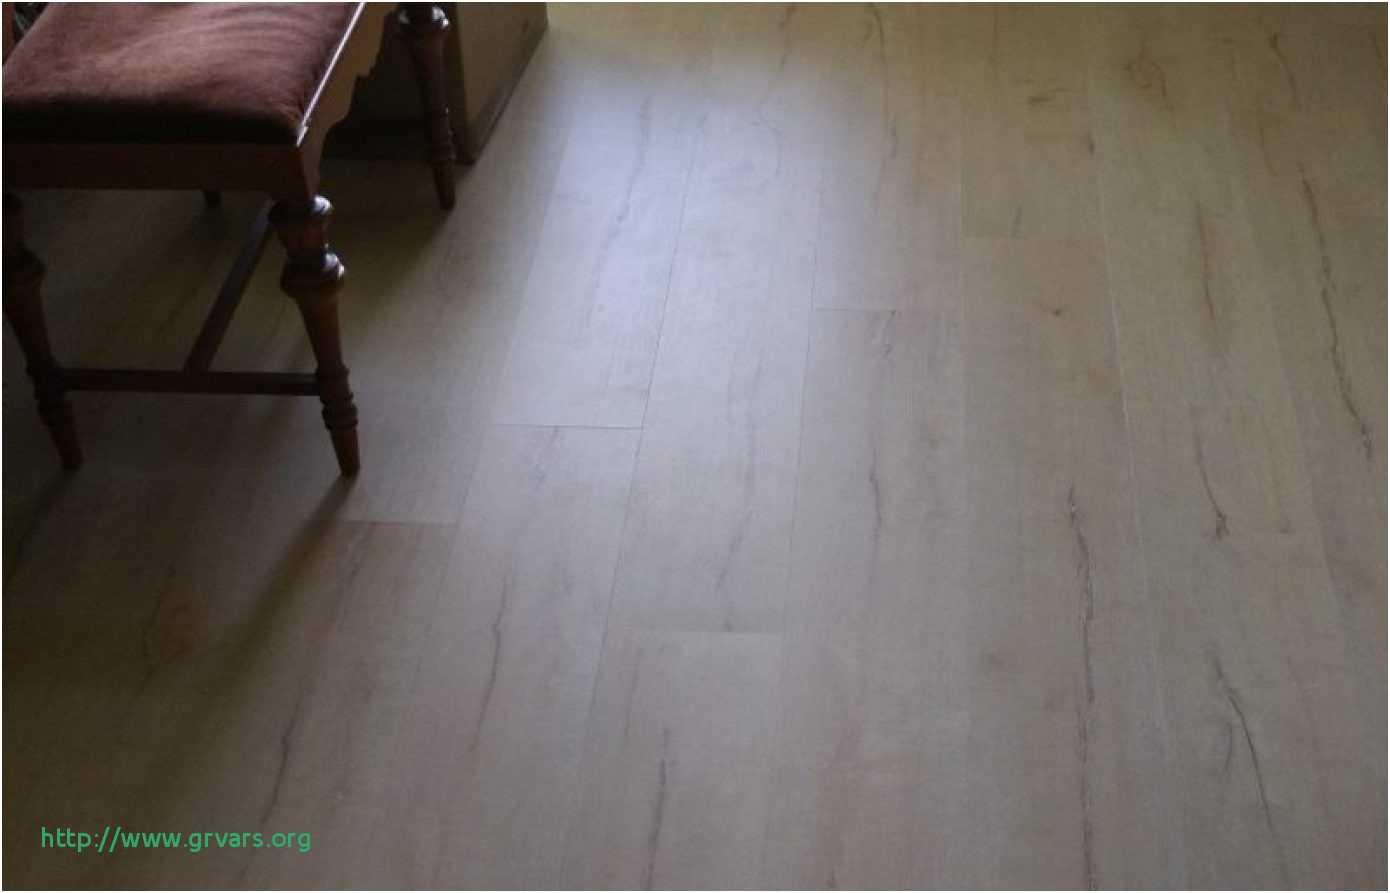 Hardwood Flooring Ontario Of 24 Beau Best Way to Polish Laminate Flooring Ideas Blog Regarding Best Way to Polish Laminate Flooring A‰lagant How to Shine Up Laminate Flooring How to Clean